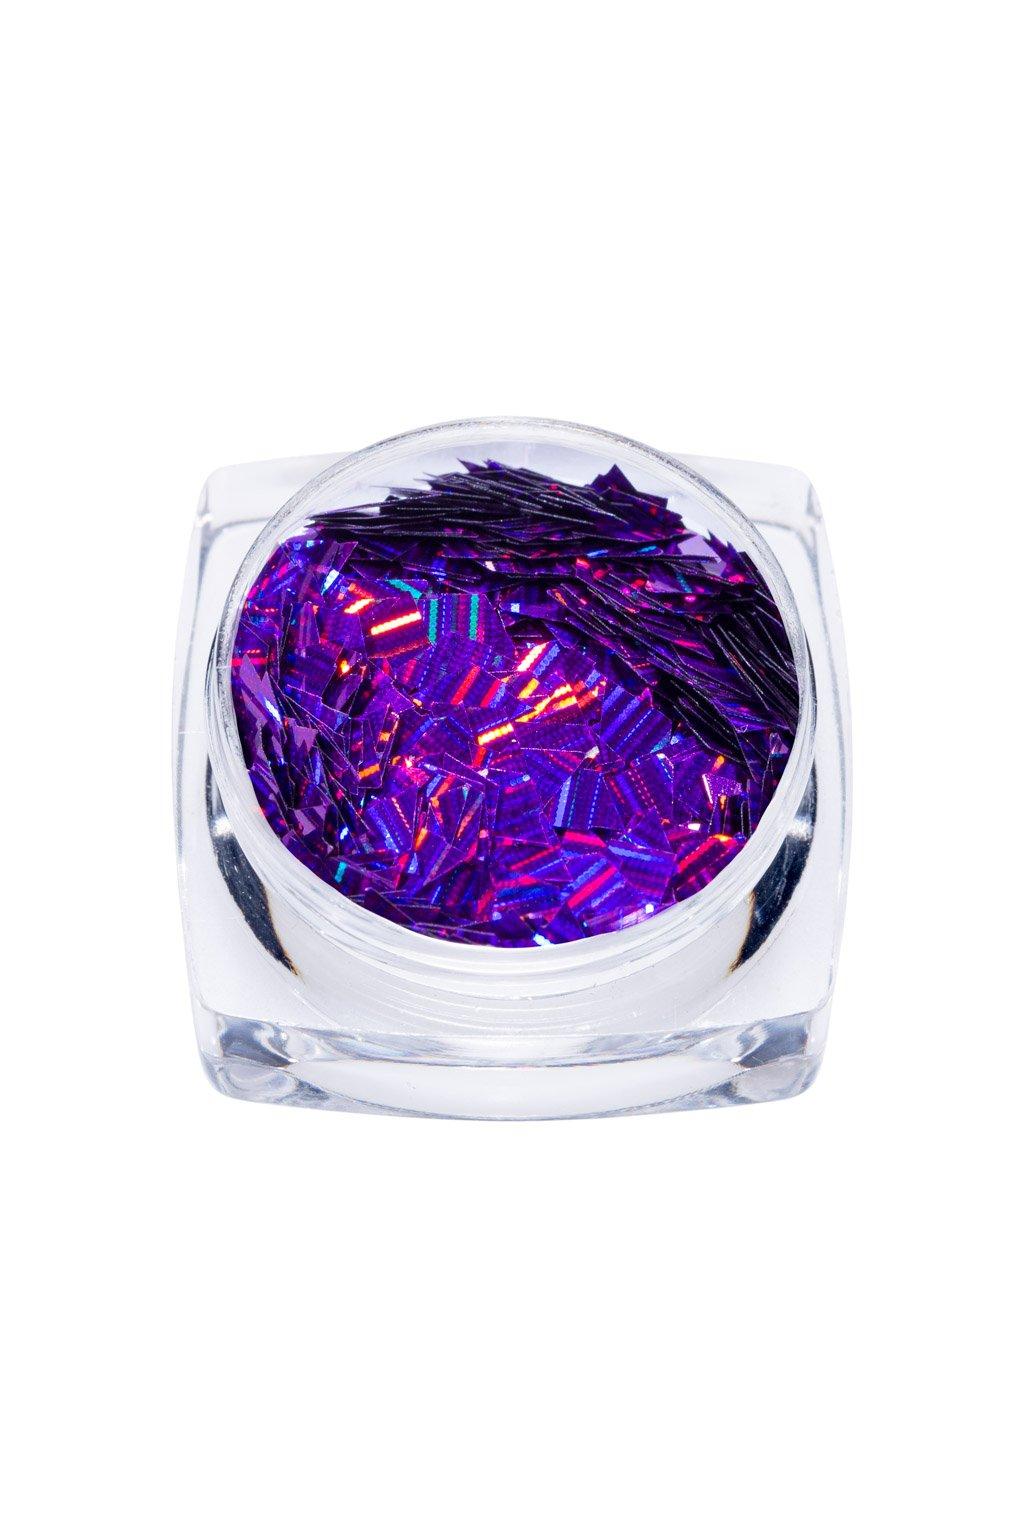 24080 purple holo diamond